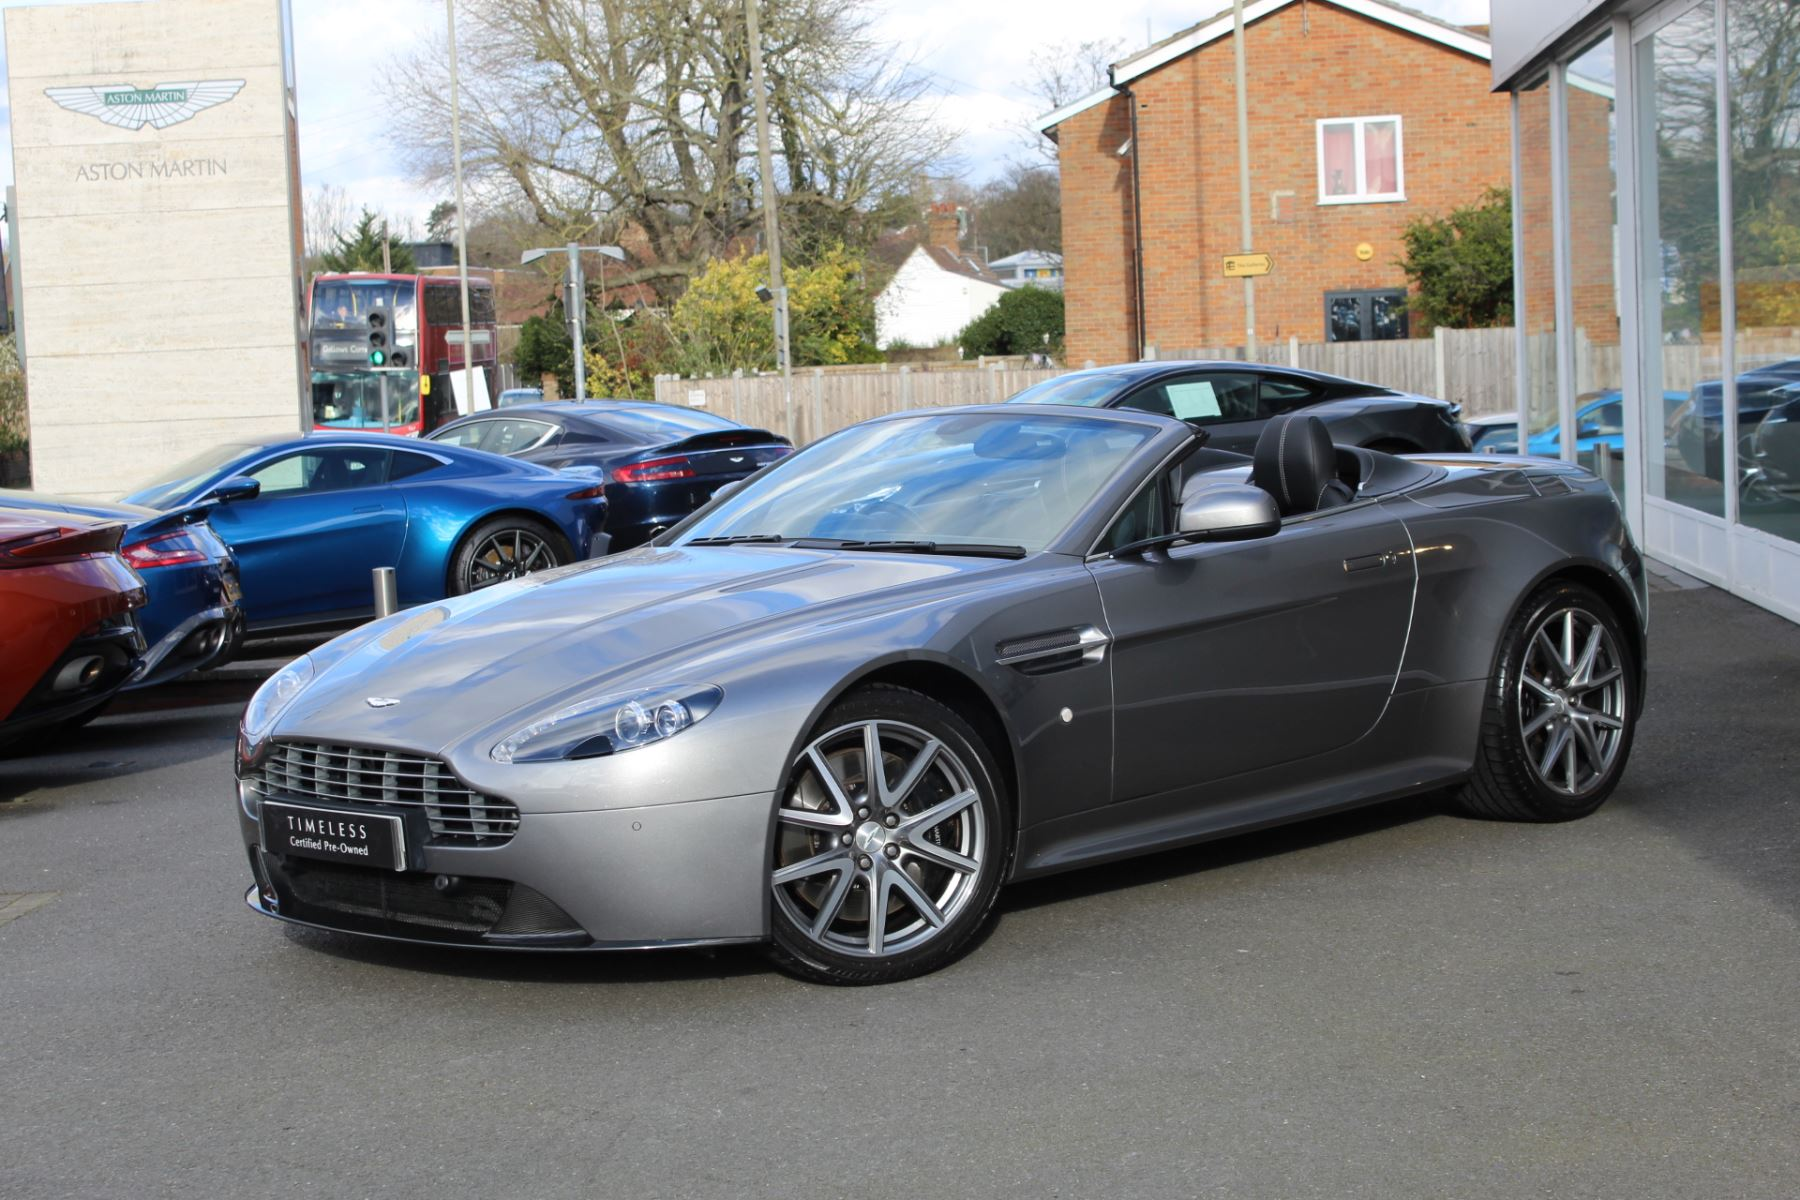 Aston Martin V8 Vantage S Roadster S 2dr Sportshift  Rare S Model  image 4